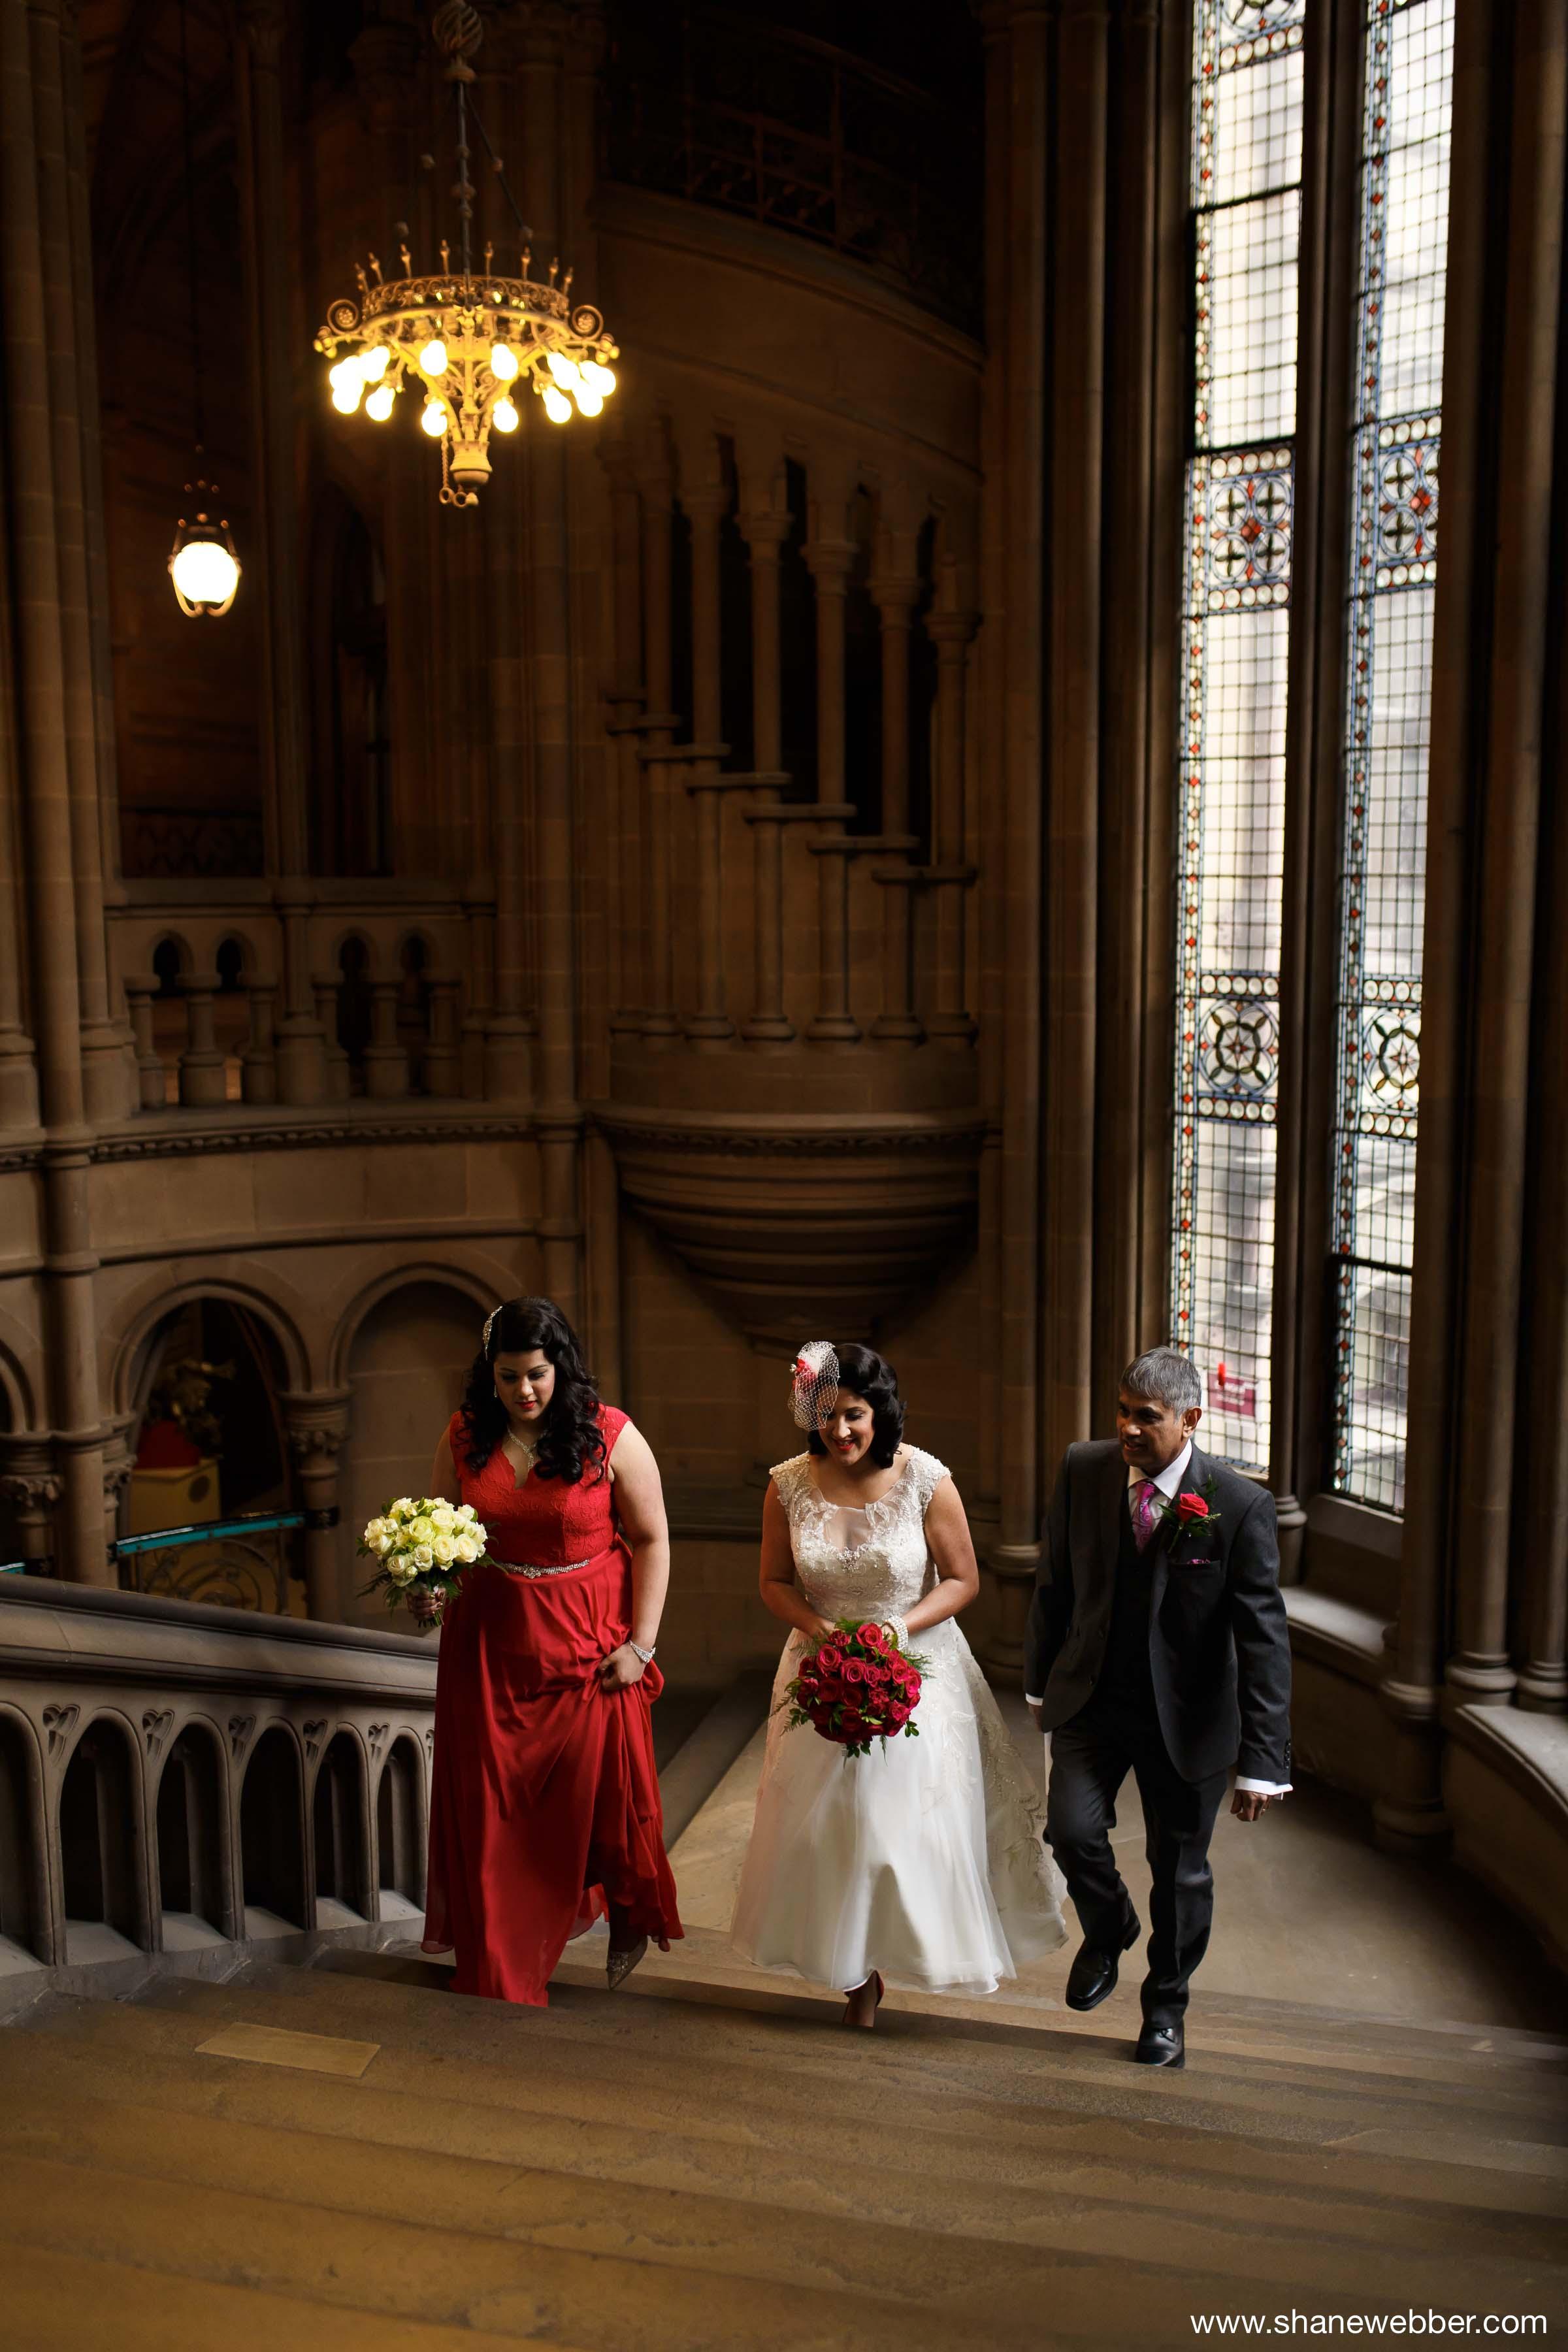 Manchester Town Hall wedding